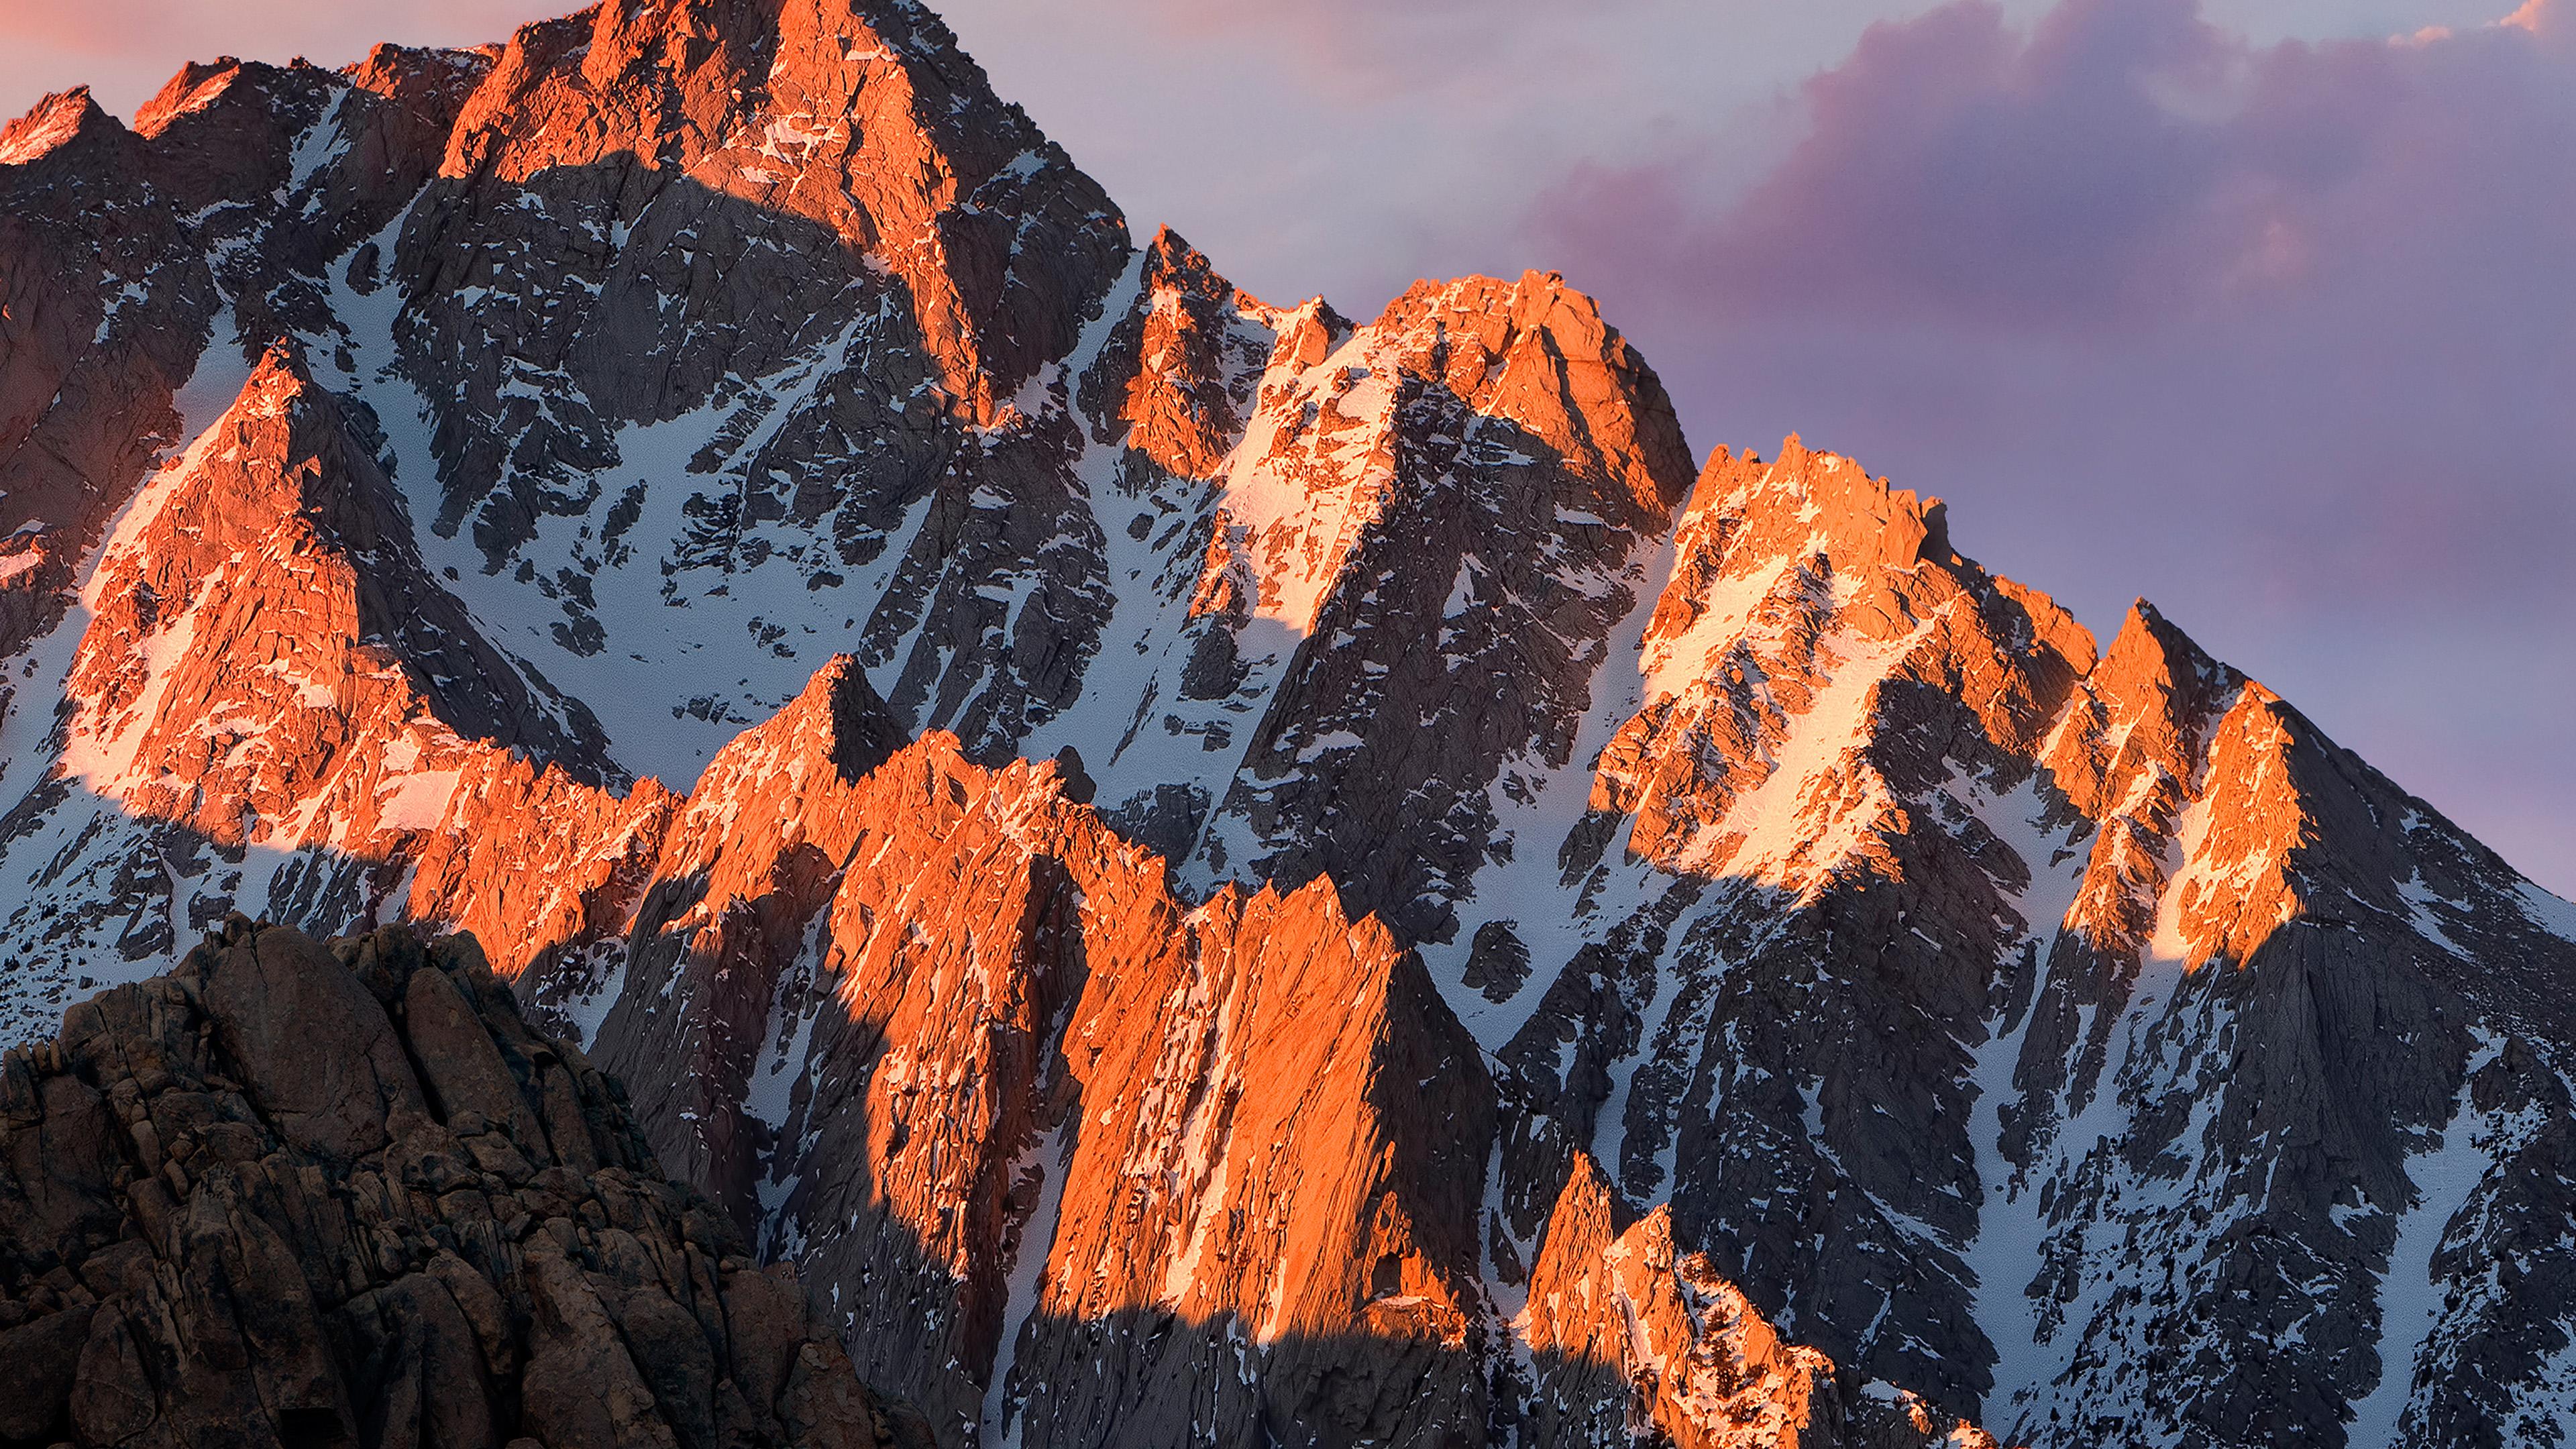 Mac Os X Yosemite Wallpaper Iphone 6 3840 X 2400